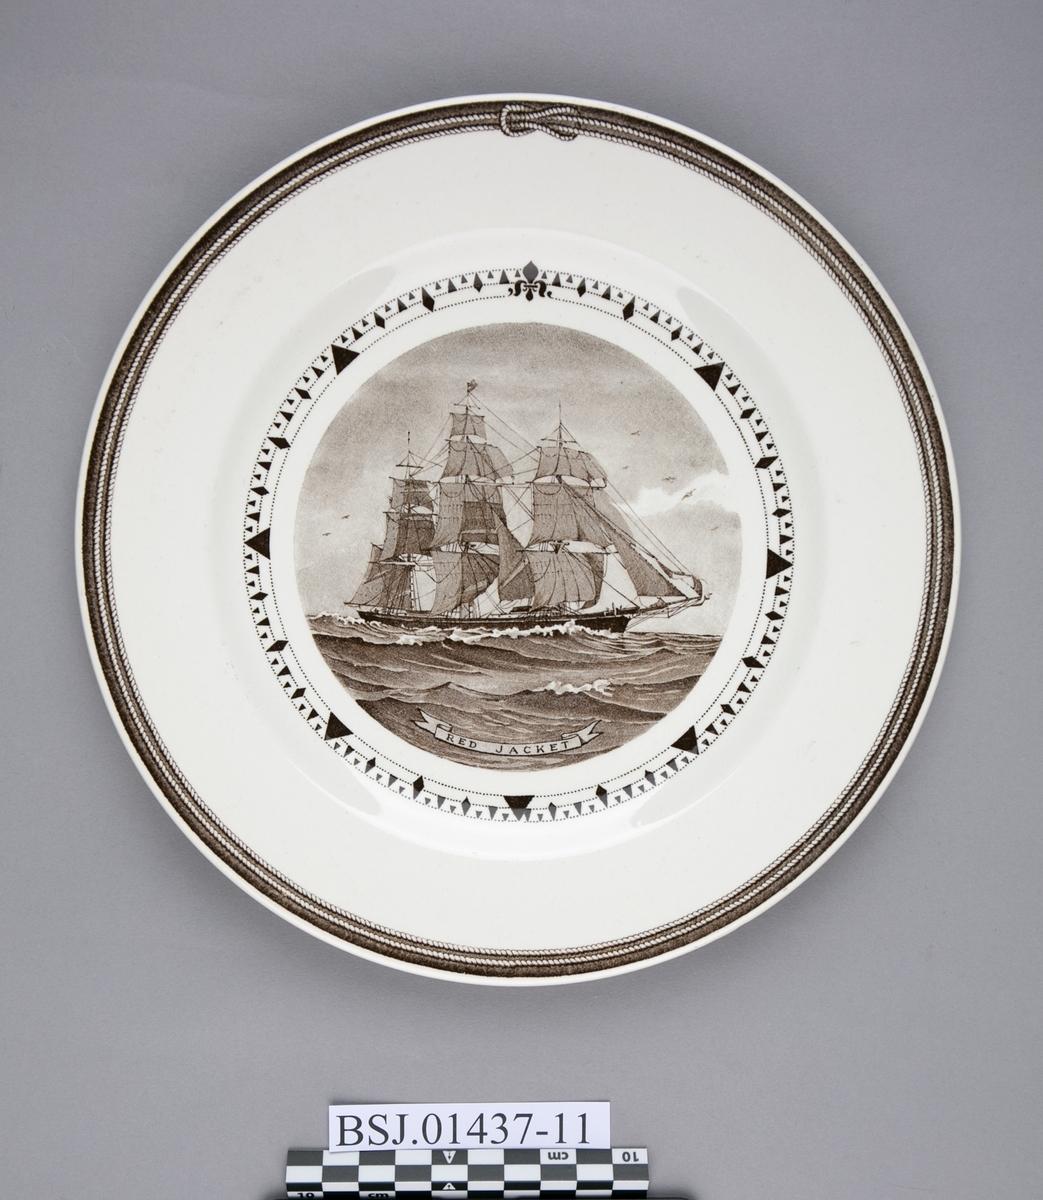 Tallerken med motiv av RED JACKET, amerikansk klipper skip